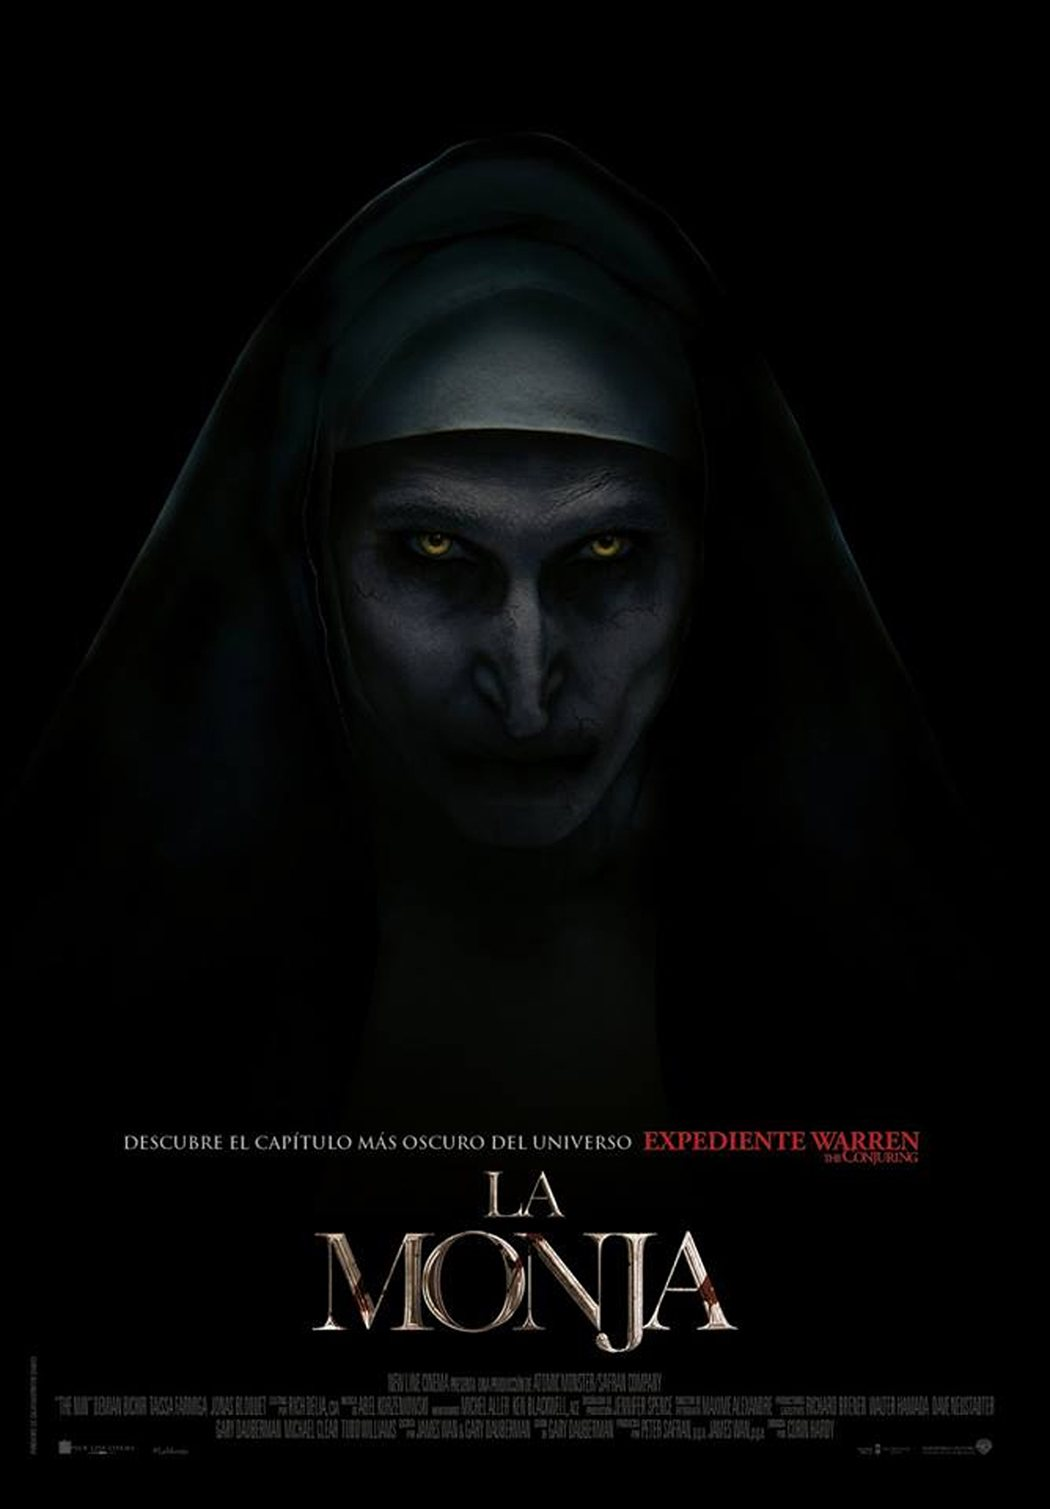 'La monja'